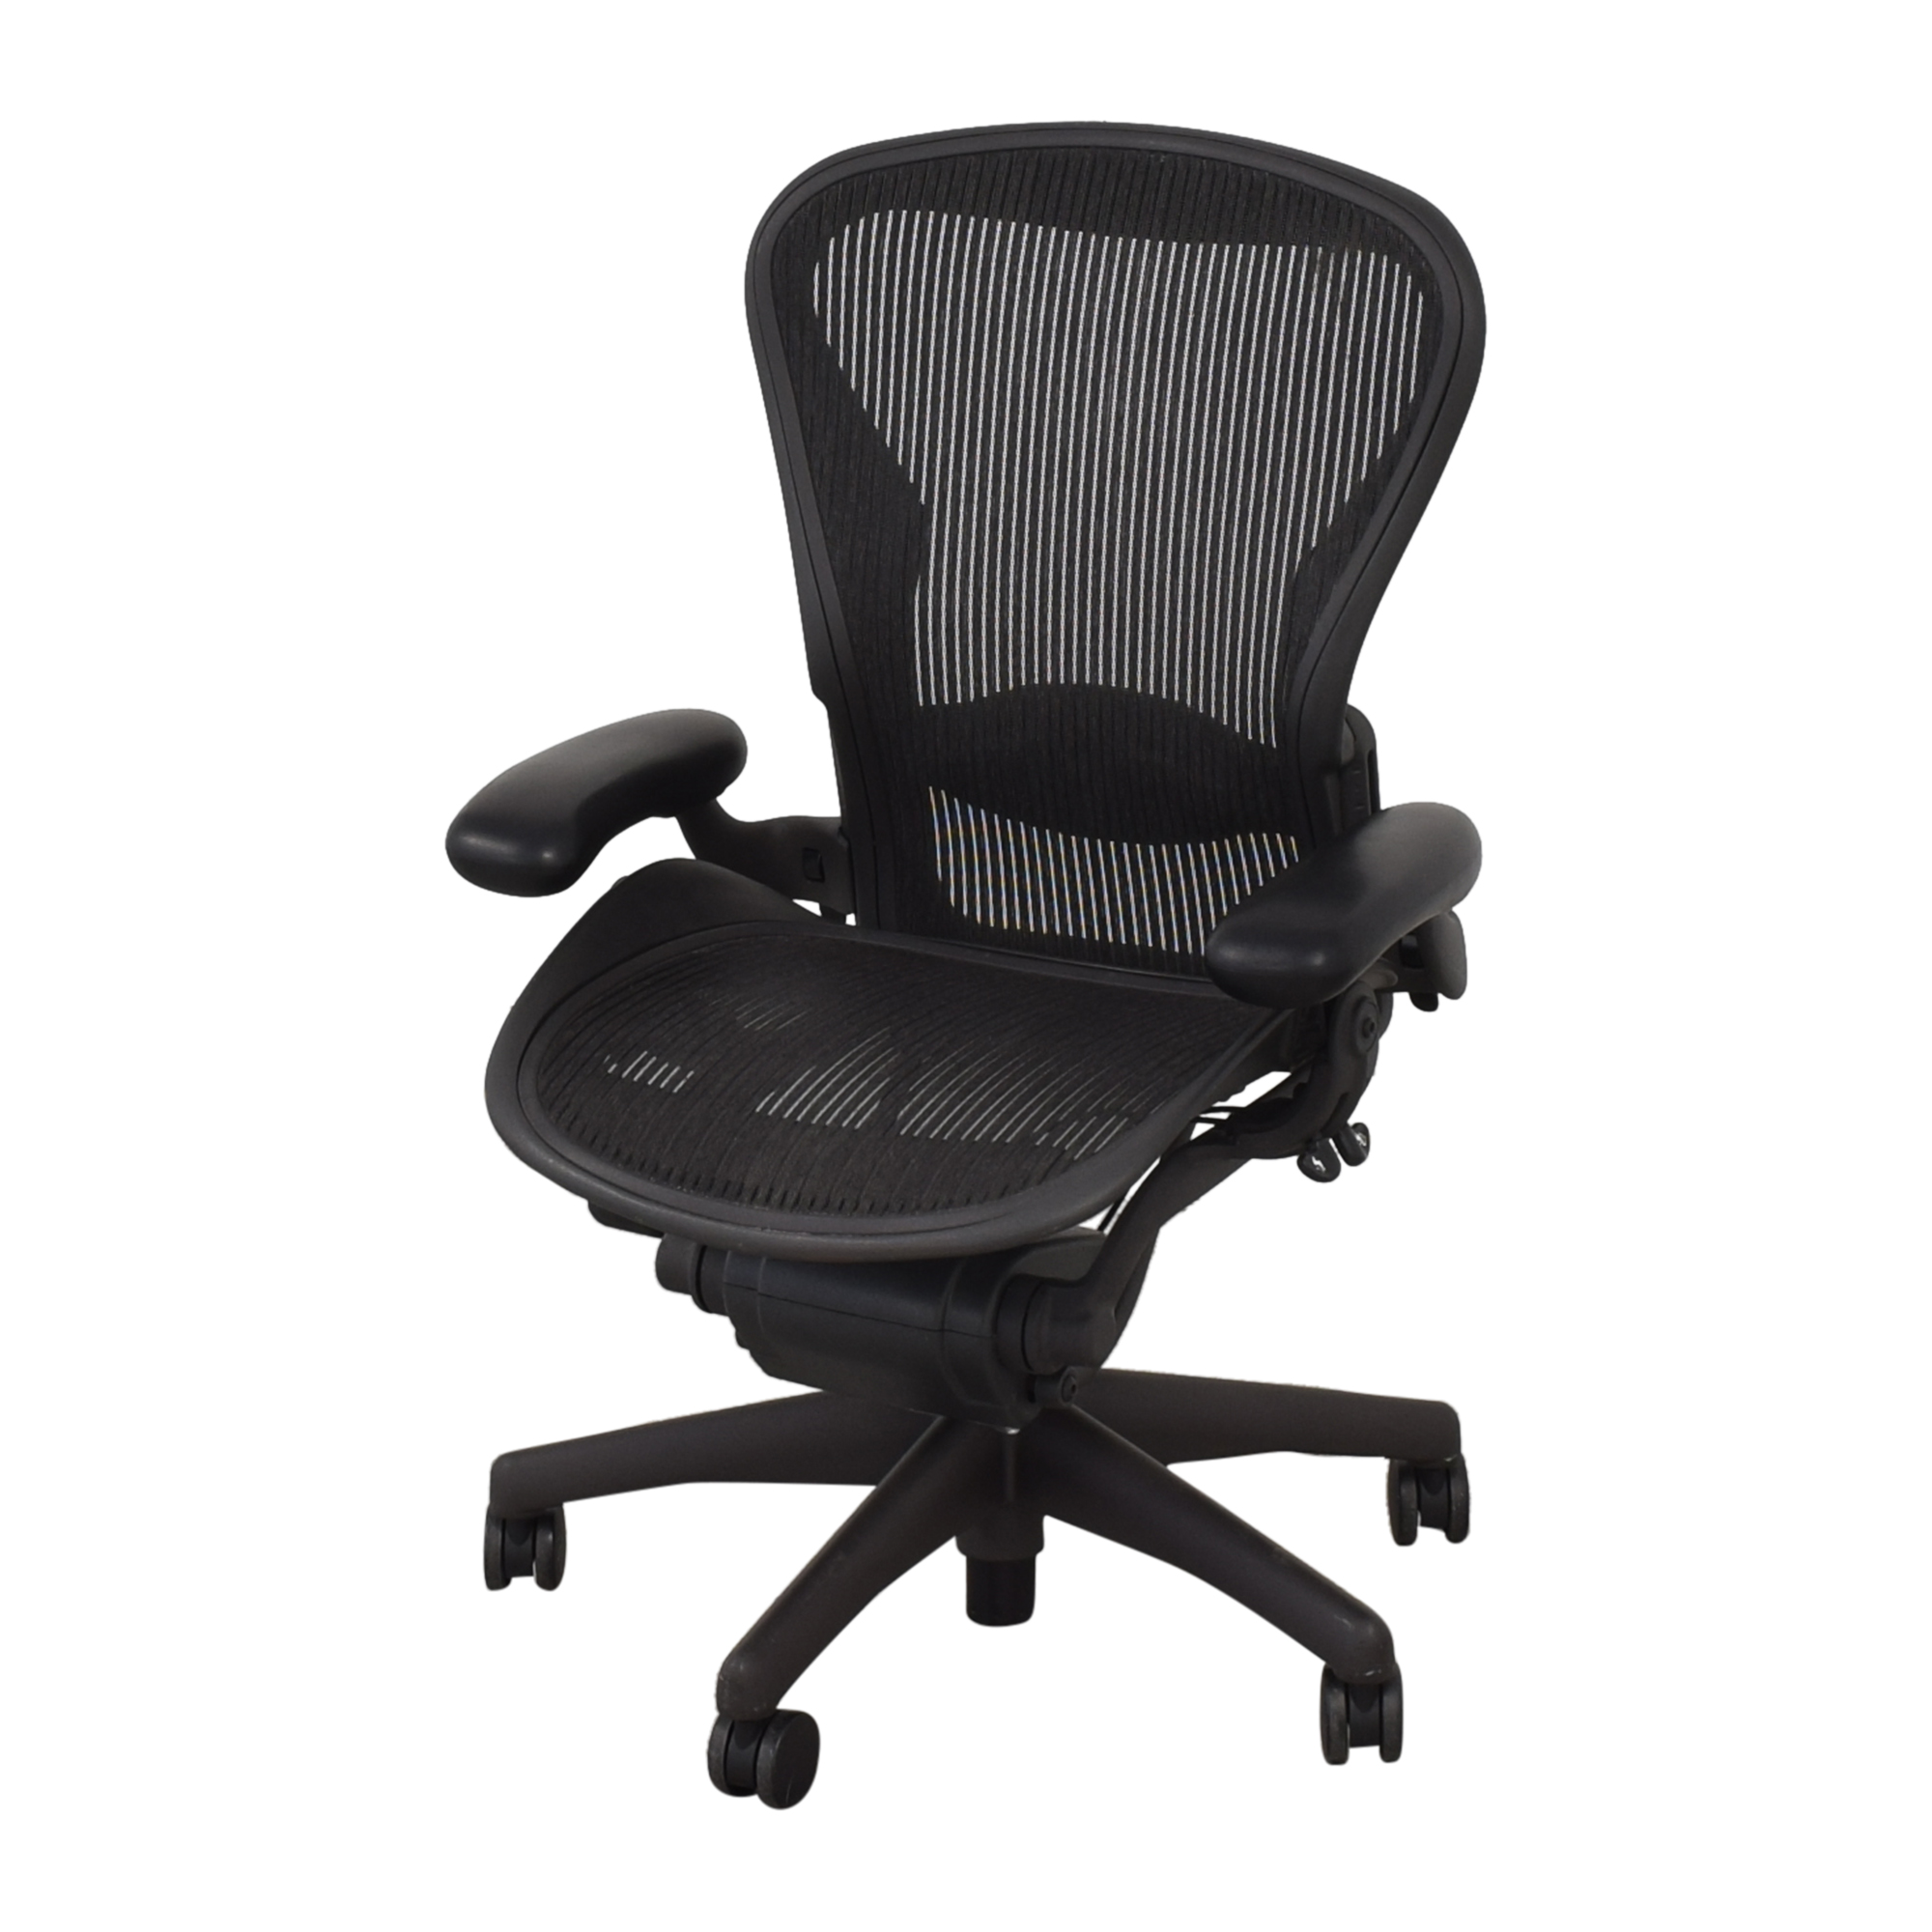 shop Herman Miller Herman Miller Aeron Chair online